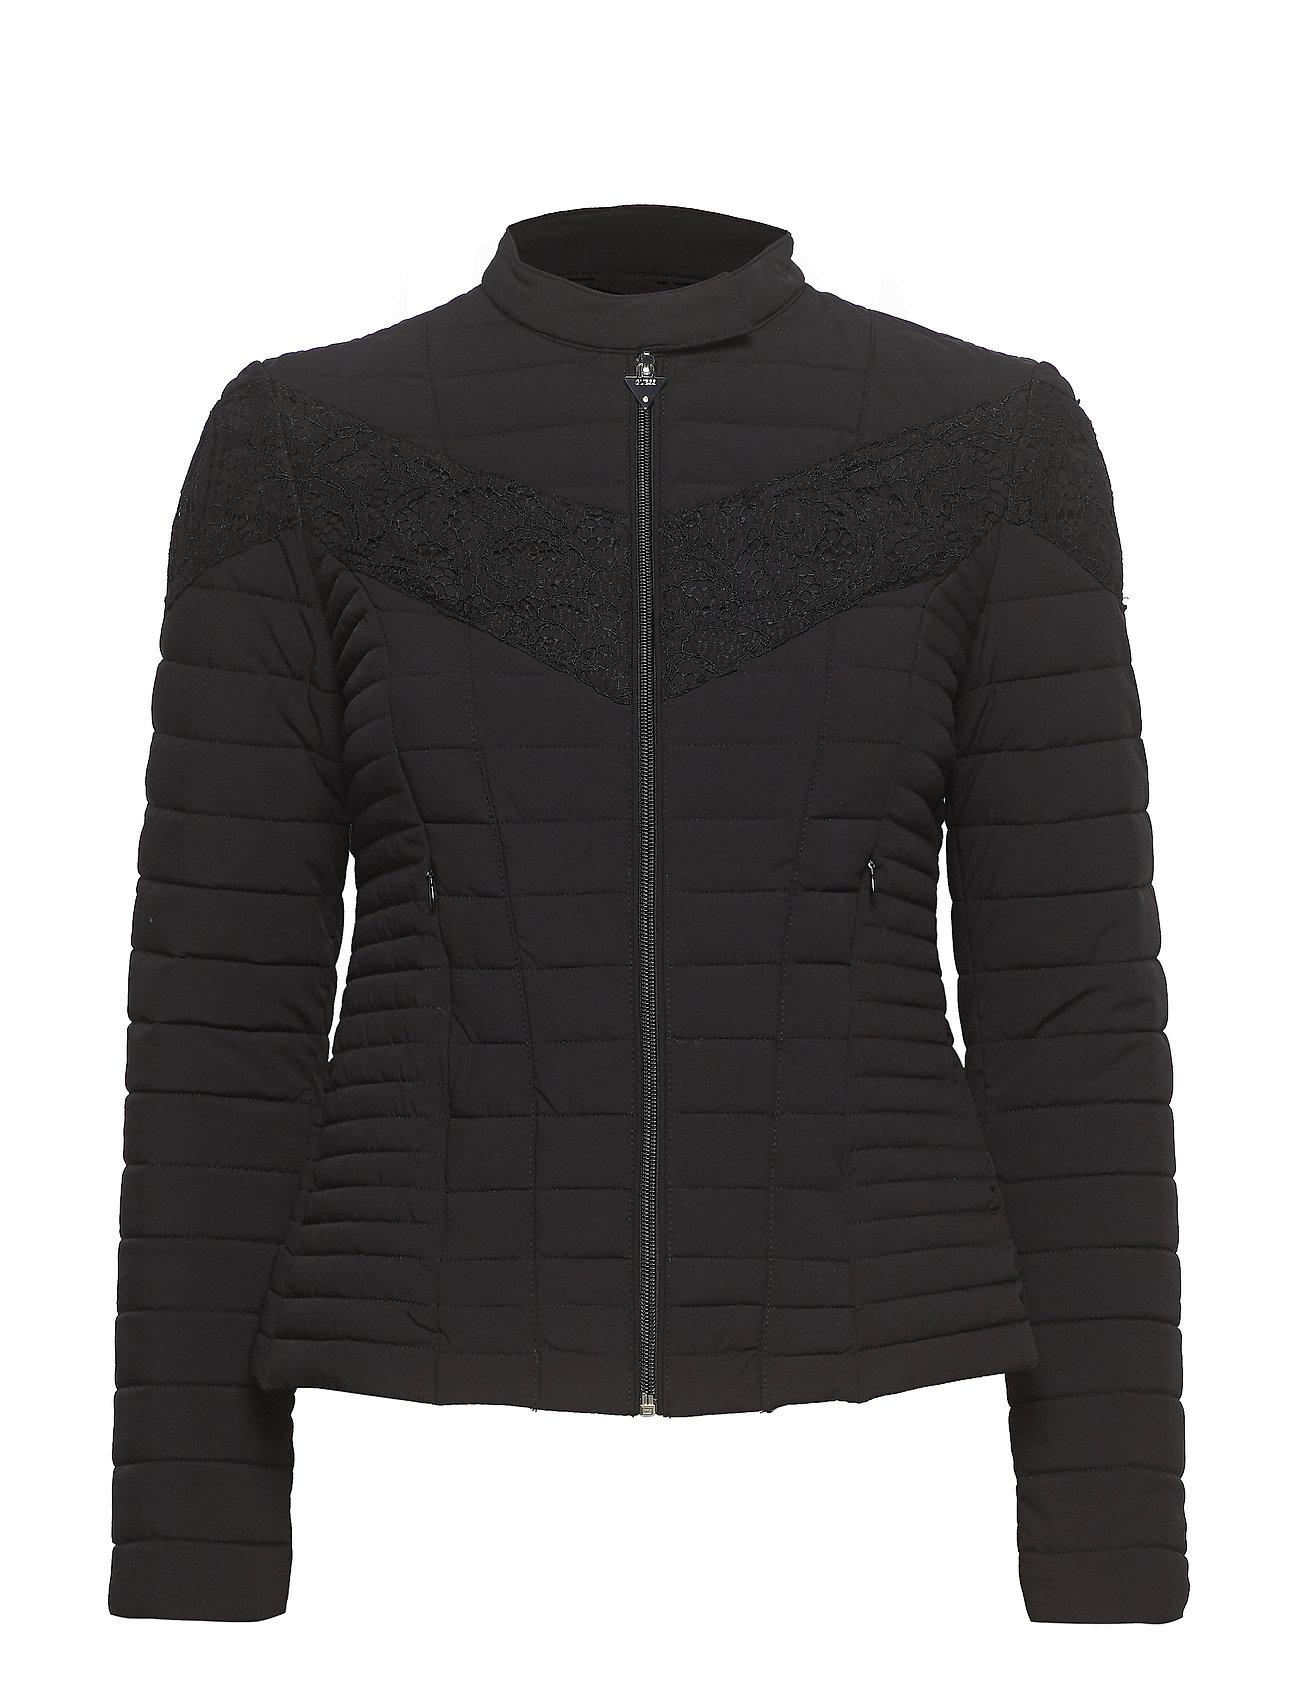 GUESS Jeans VONA JACKET - JET BLACK A996